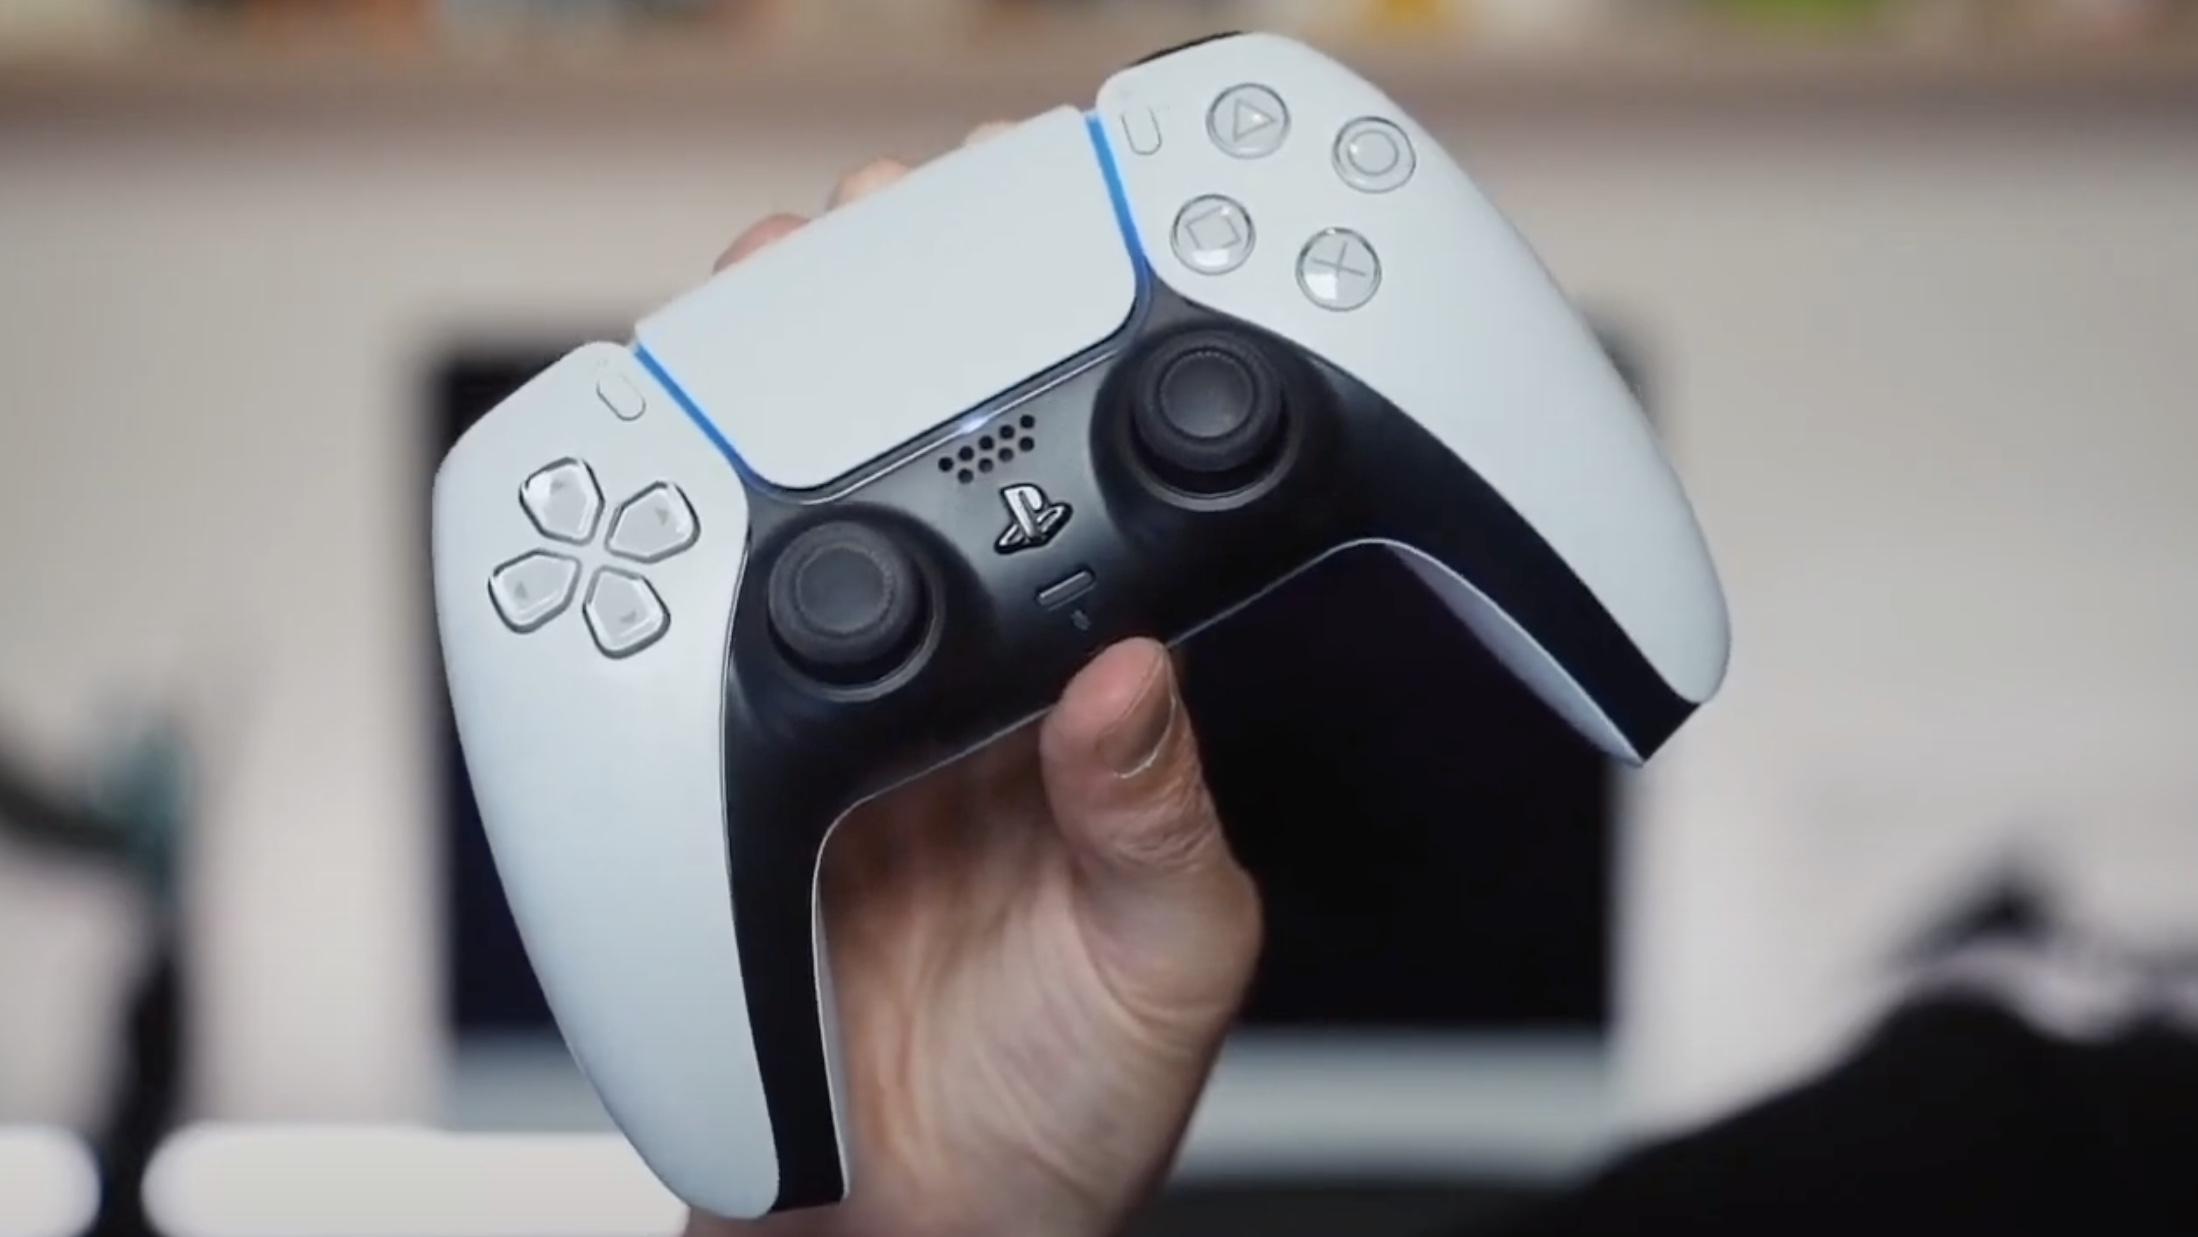 sony playstation 5 dualsense controller 2020 game console next gen